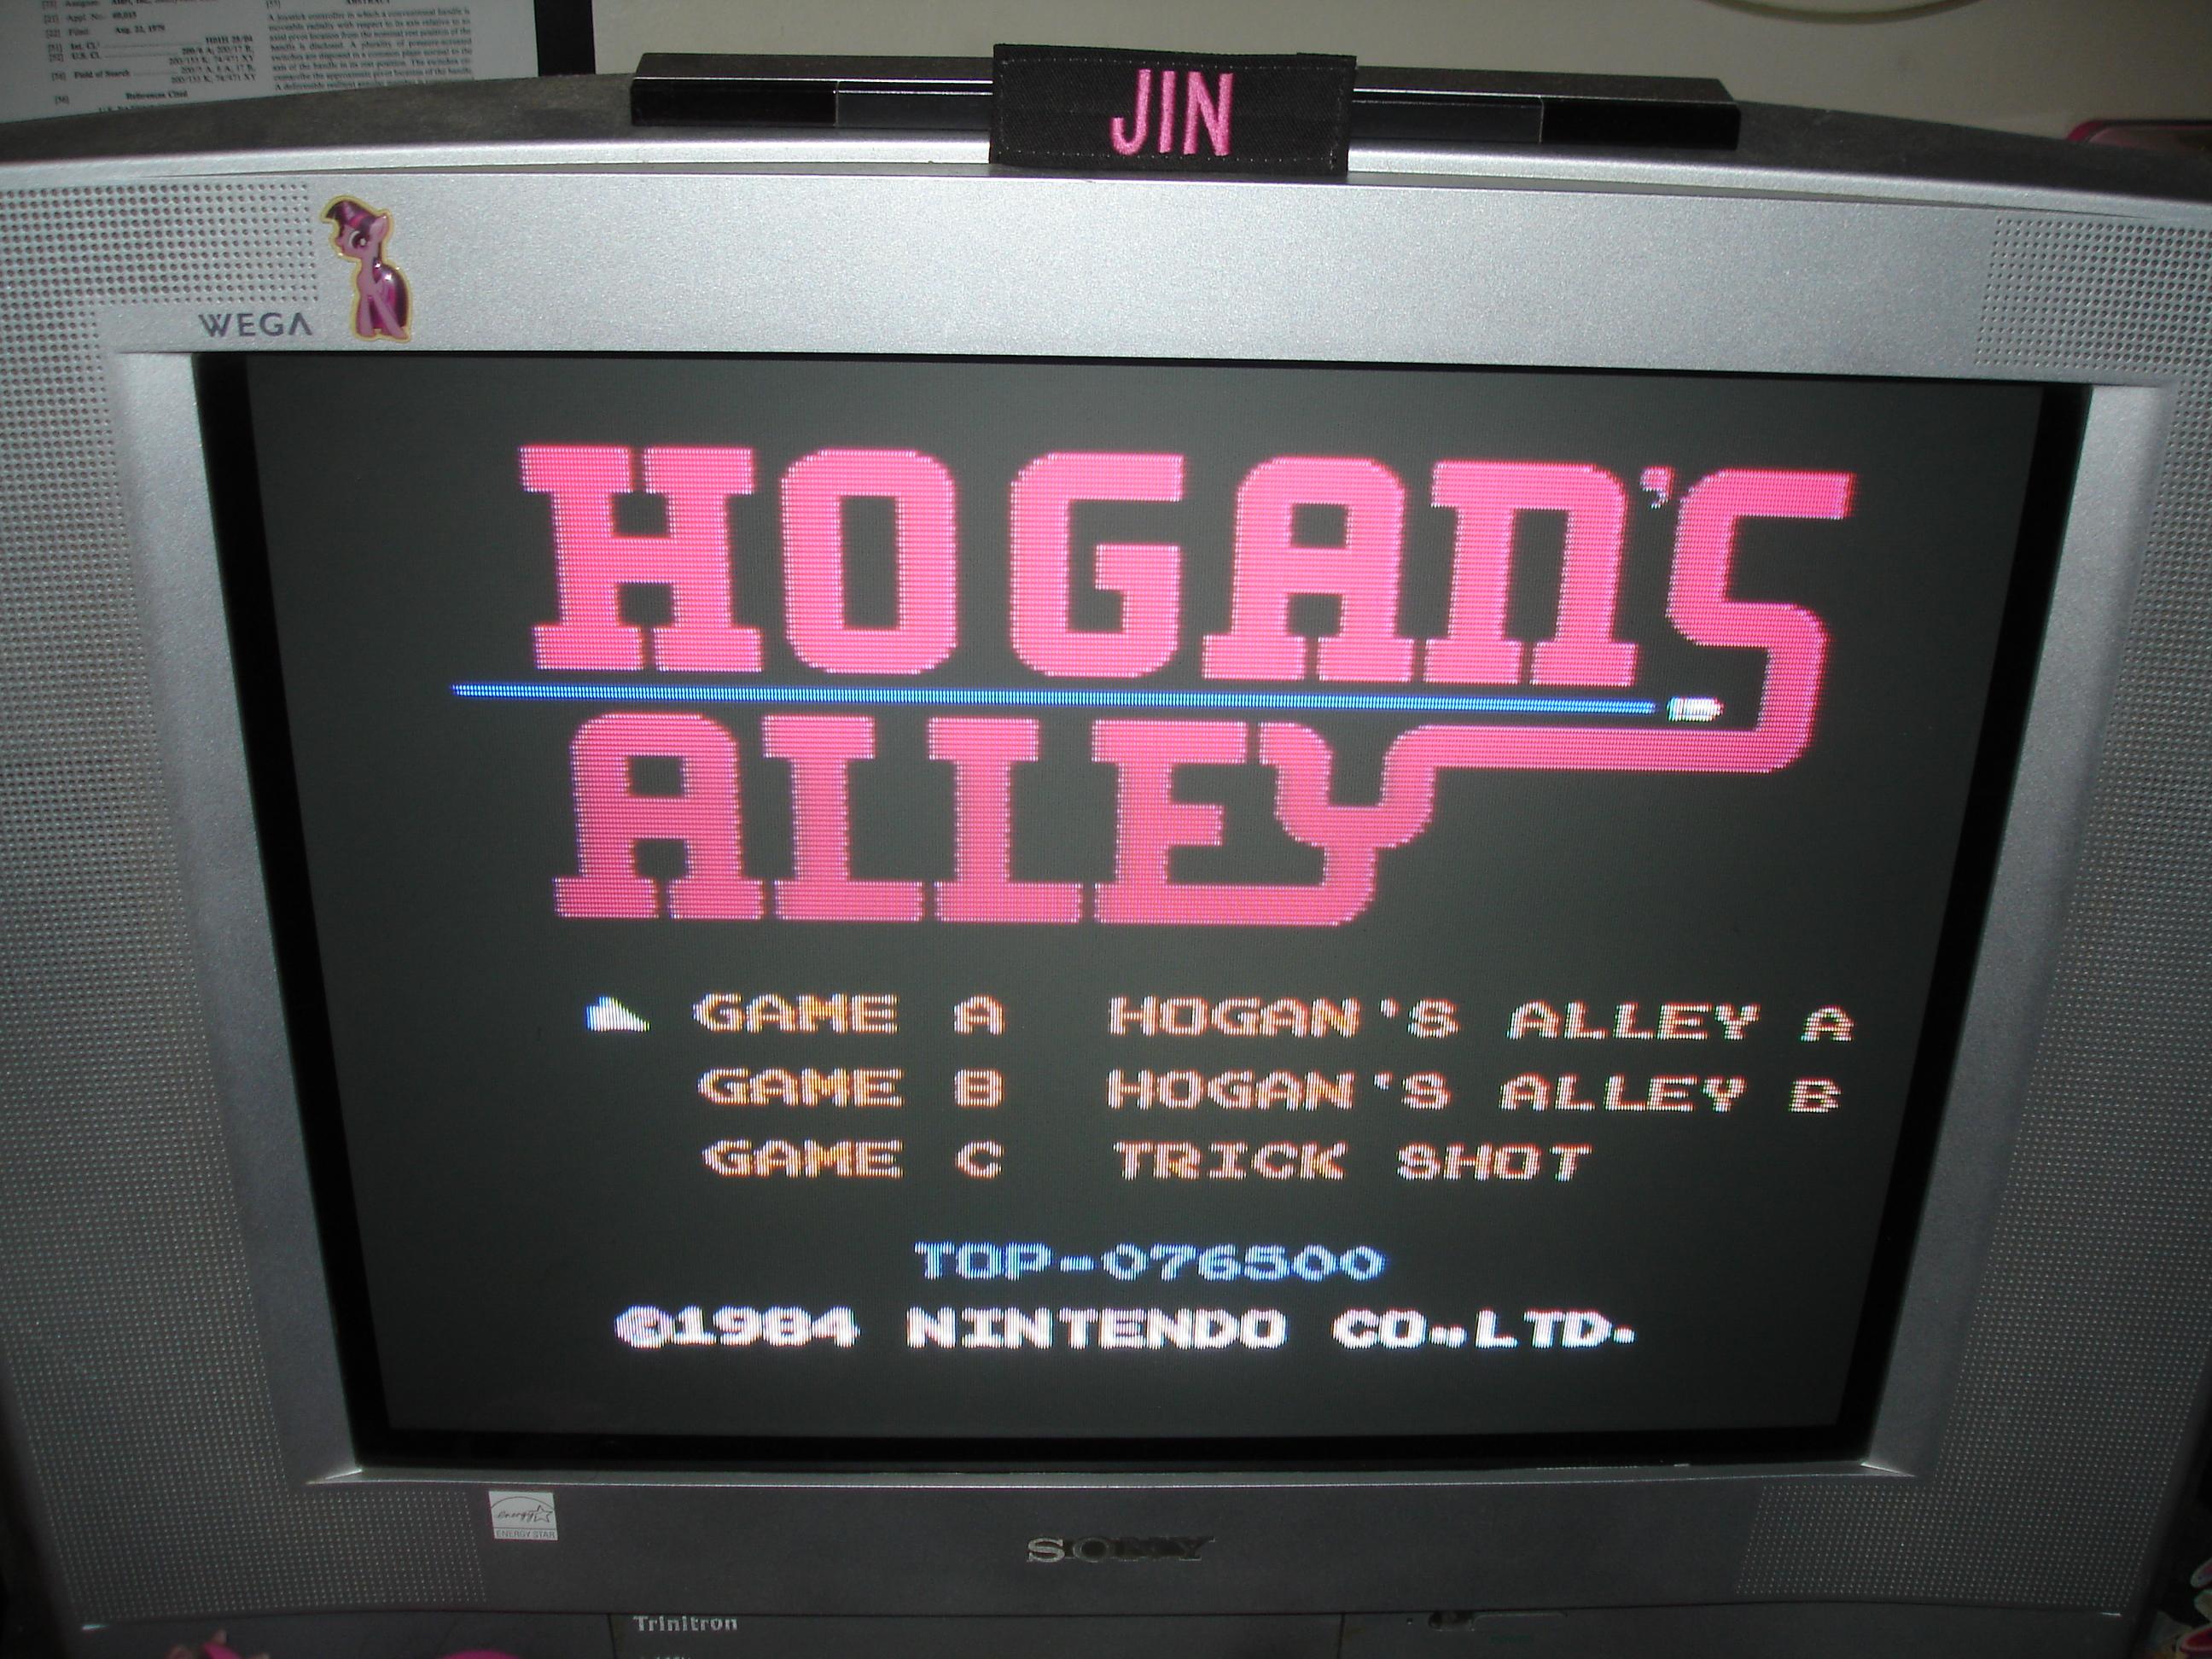 Jin: Hogan